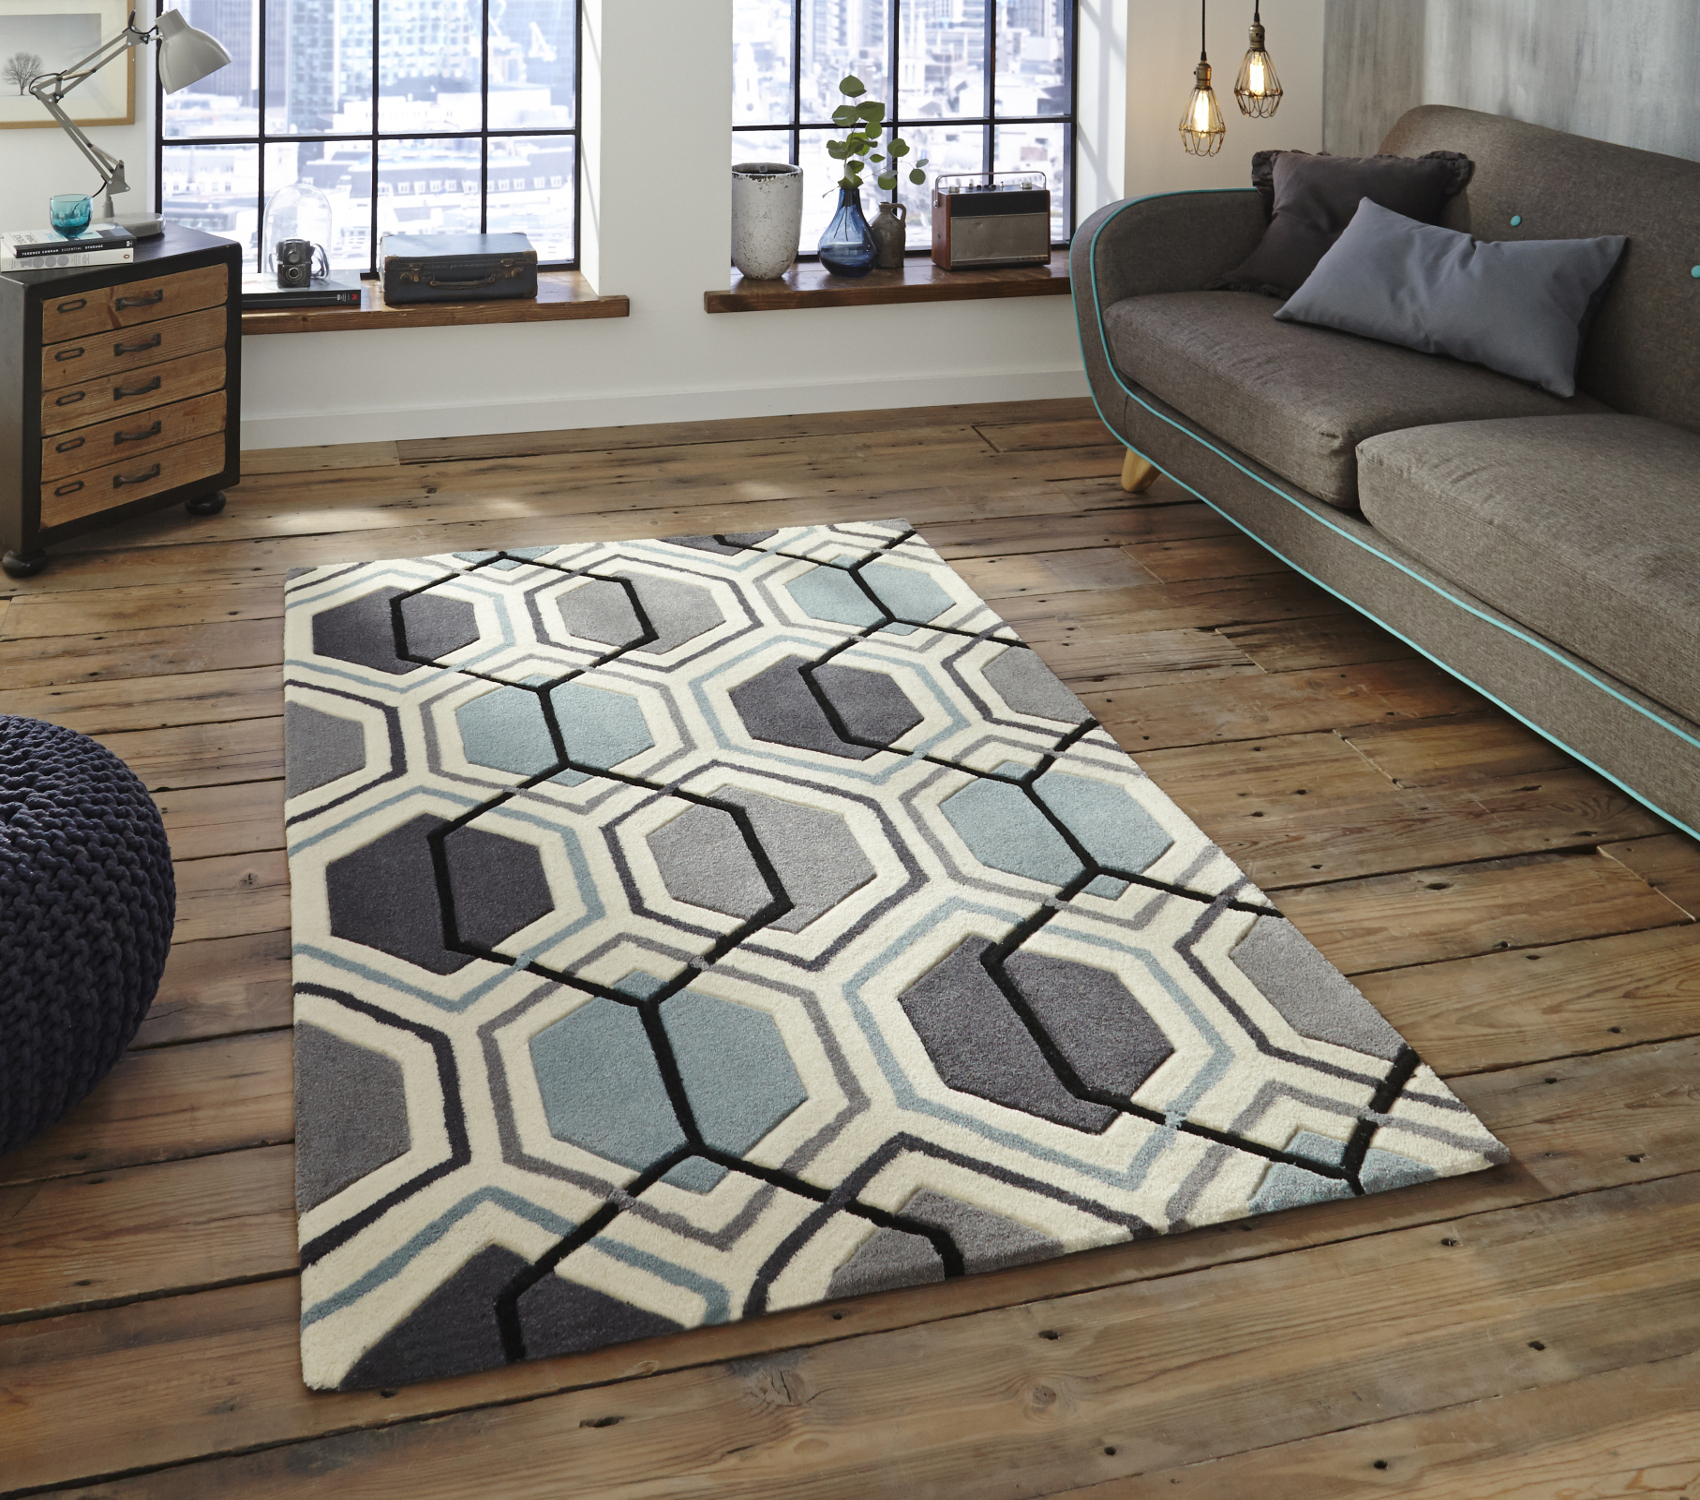 large rug hong-kong-hexagon-rug-100-acrylic-hand-tufted- WYNCTED